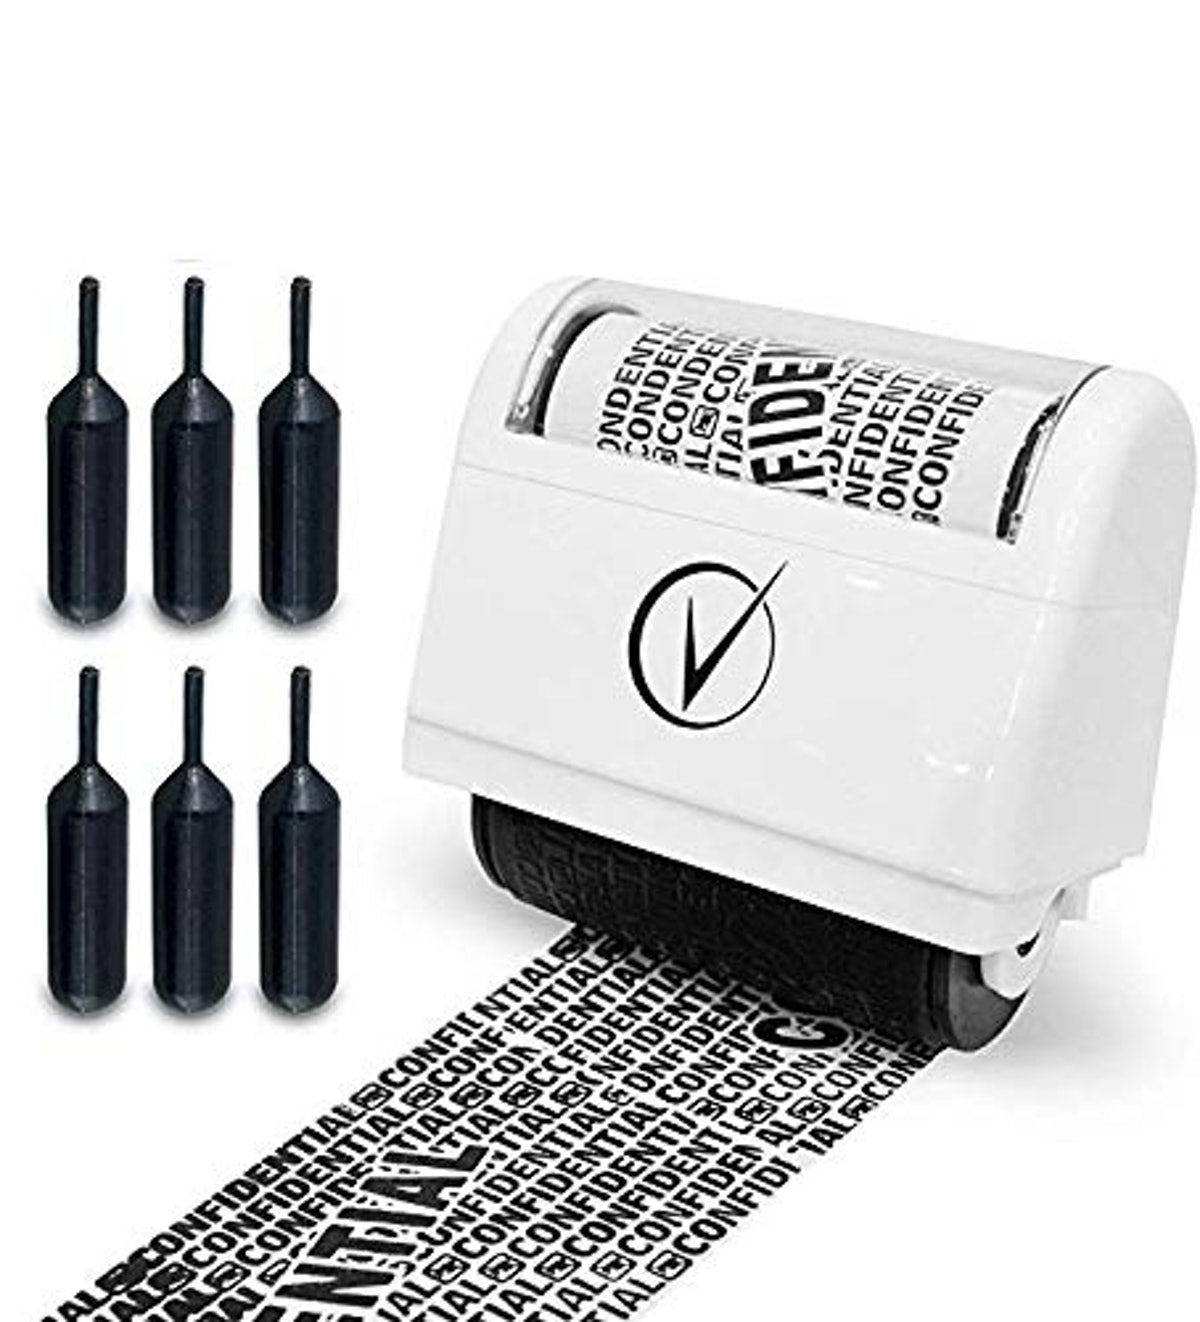 Vantamo Identity Protection Roller Stamps Wide Kit